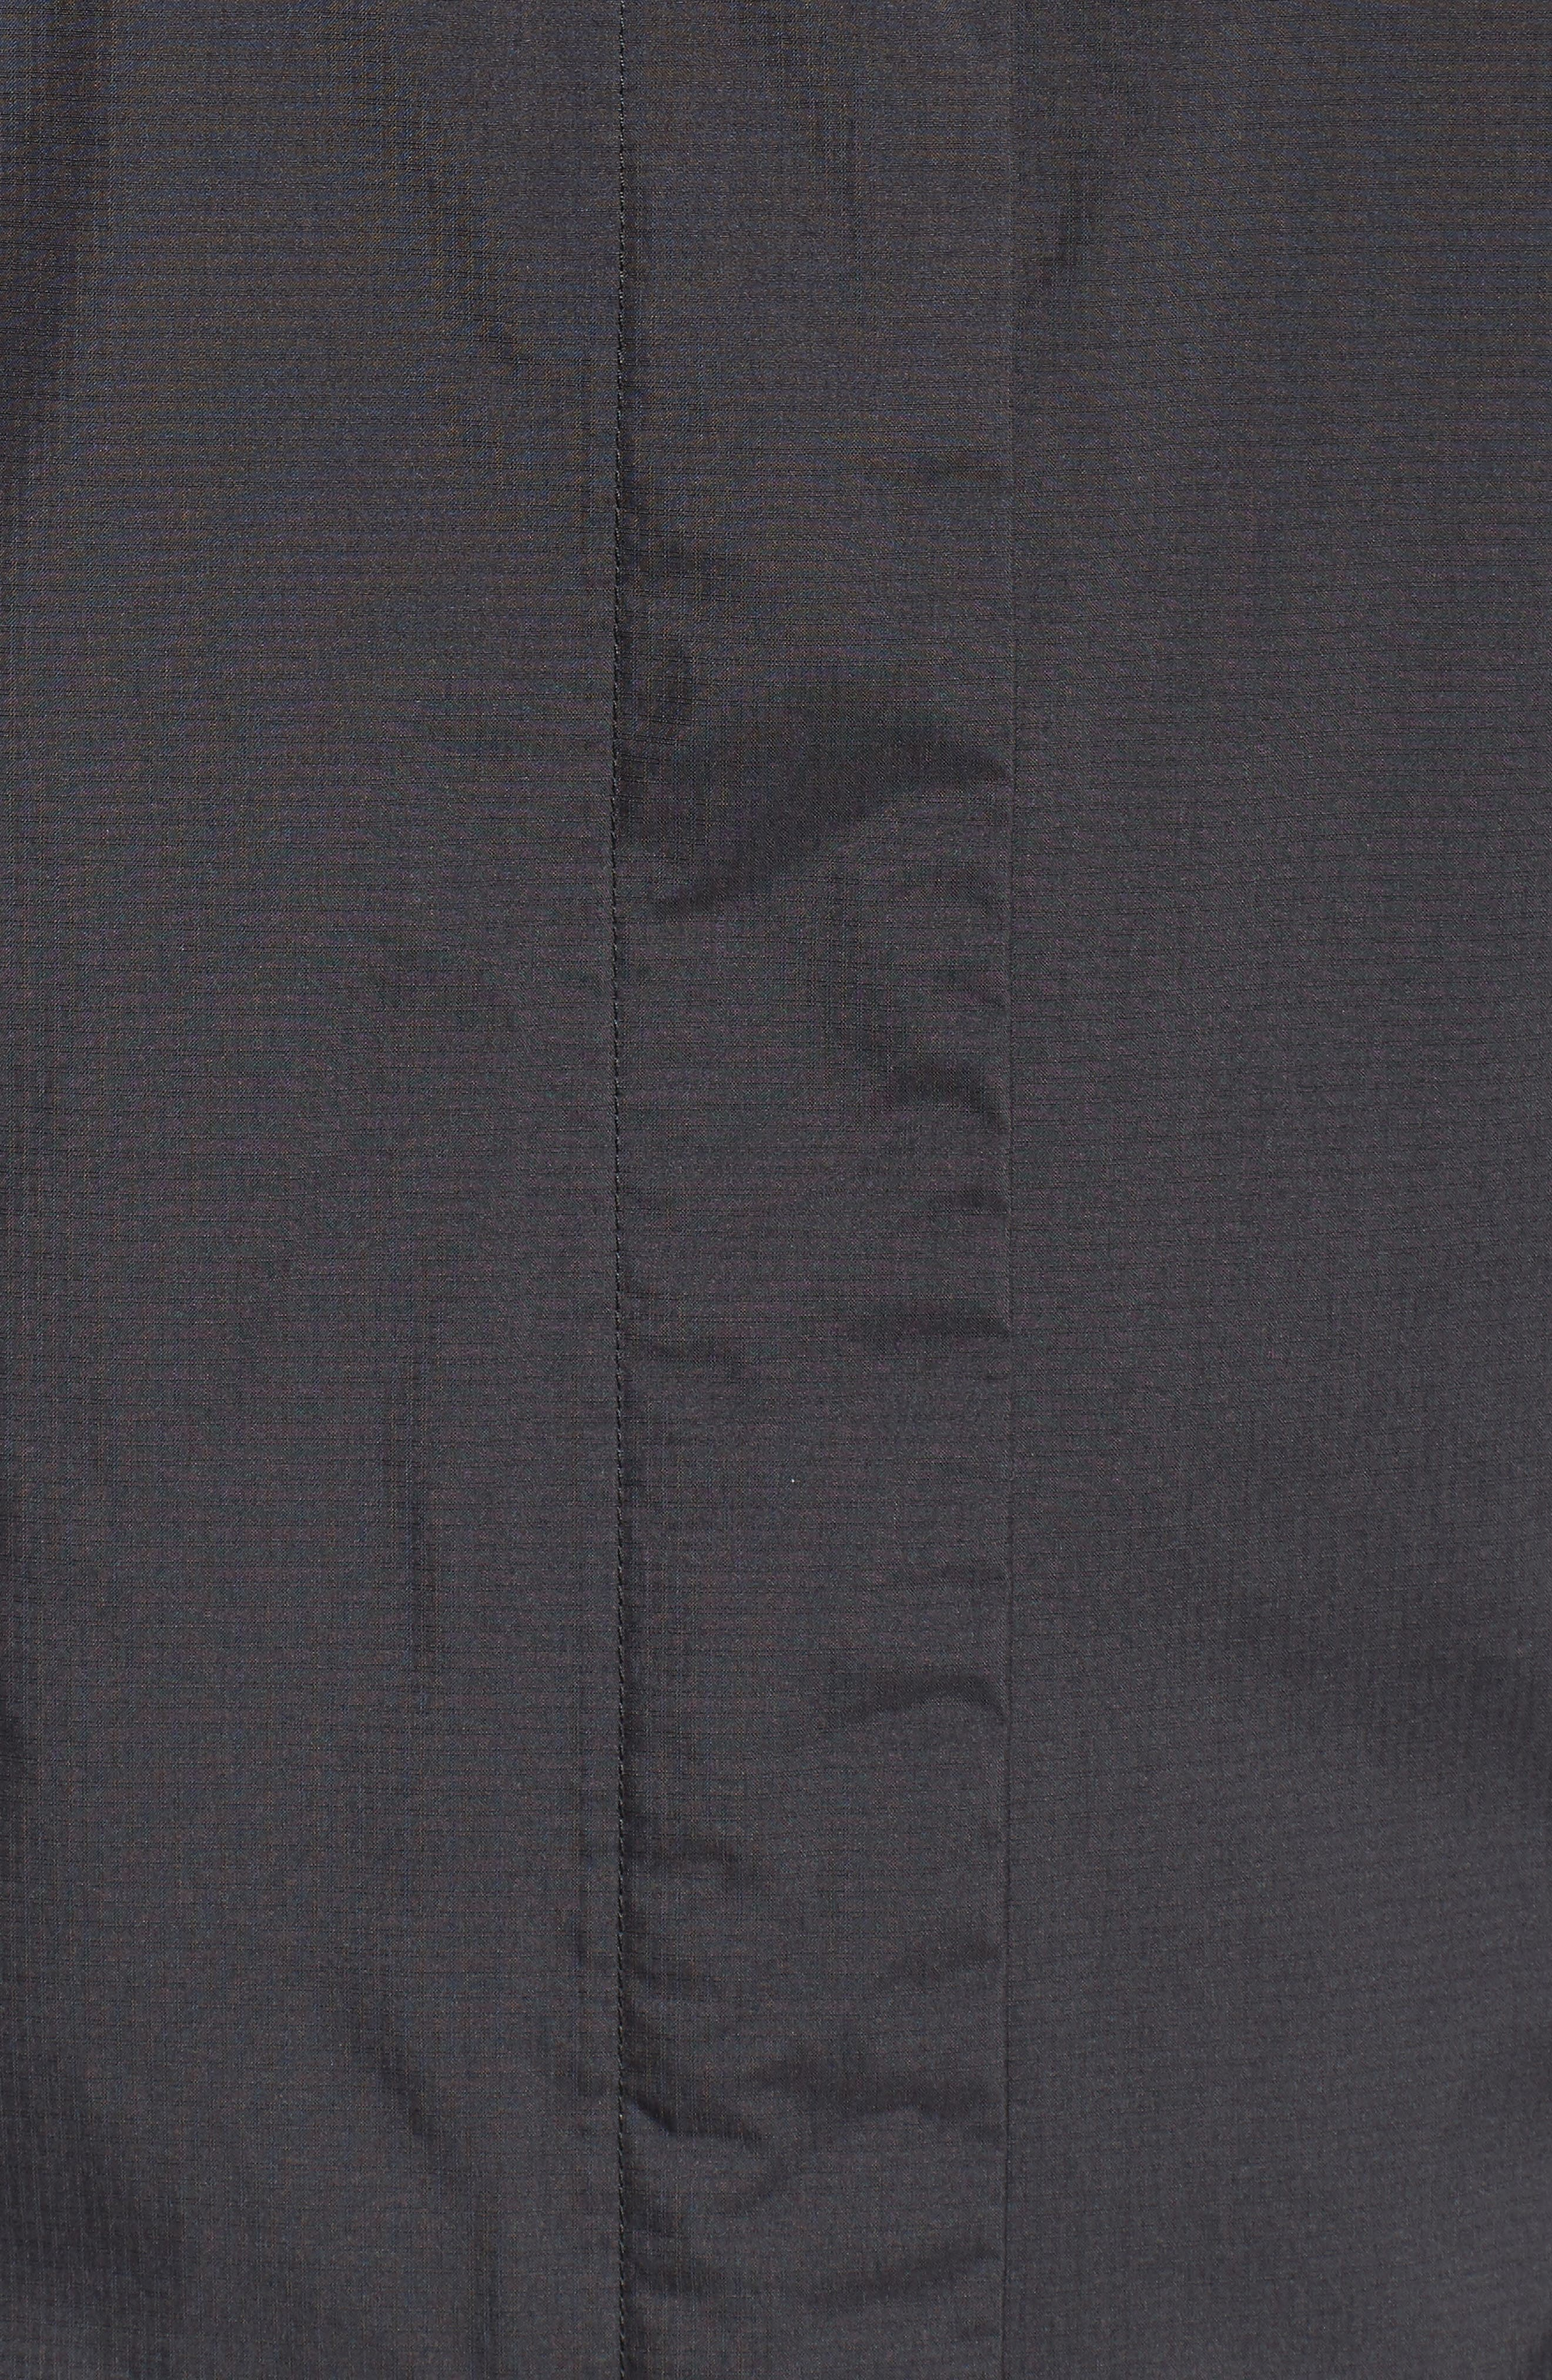 Venture 2 Waterproof Jacket,                             Alternate thumbnail 6, color,                             Tnf Black